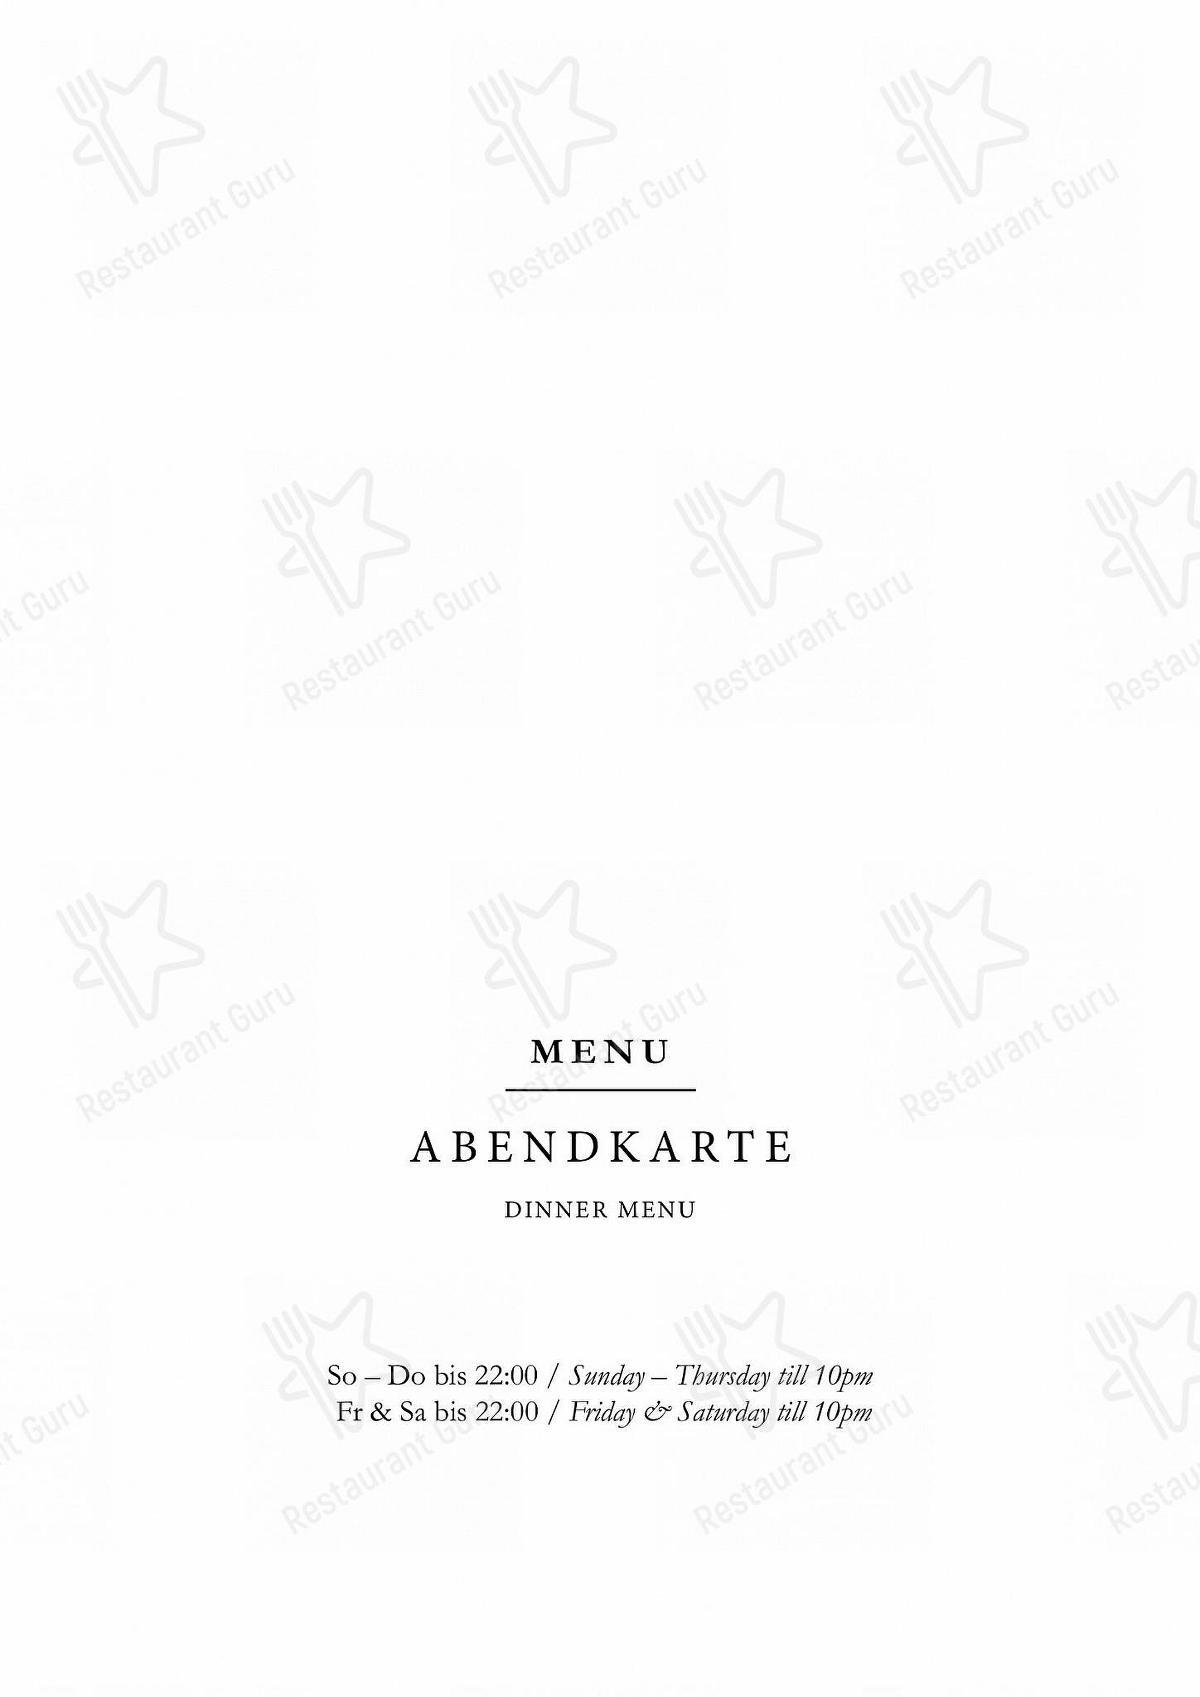 Menu for the Belle Alliance pub & bar